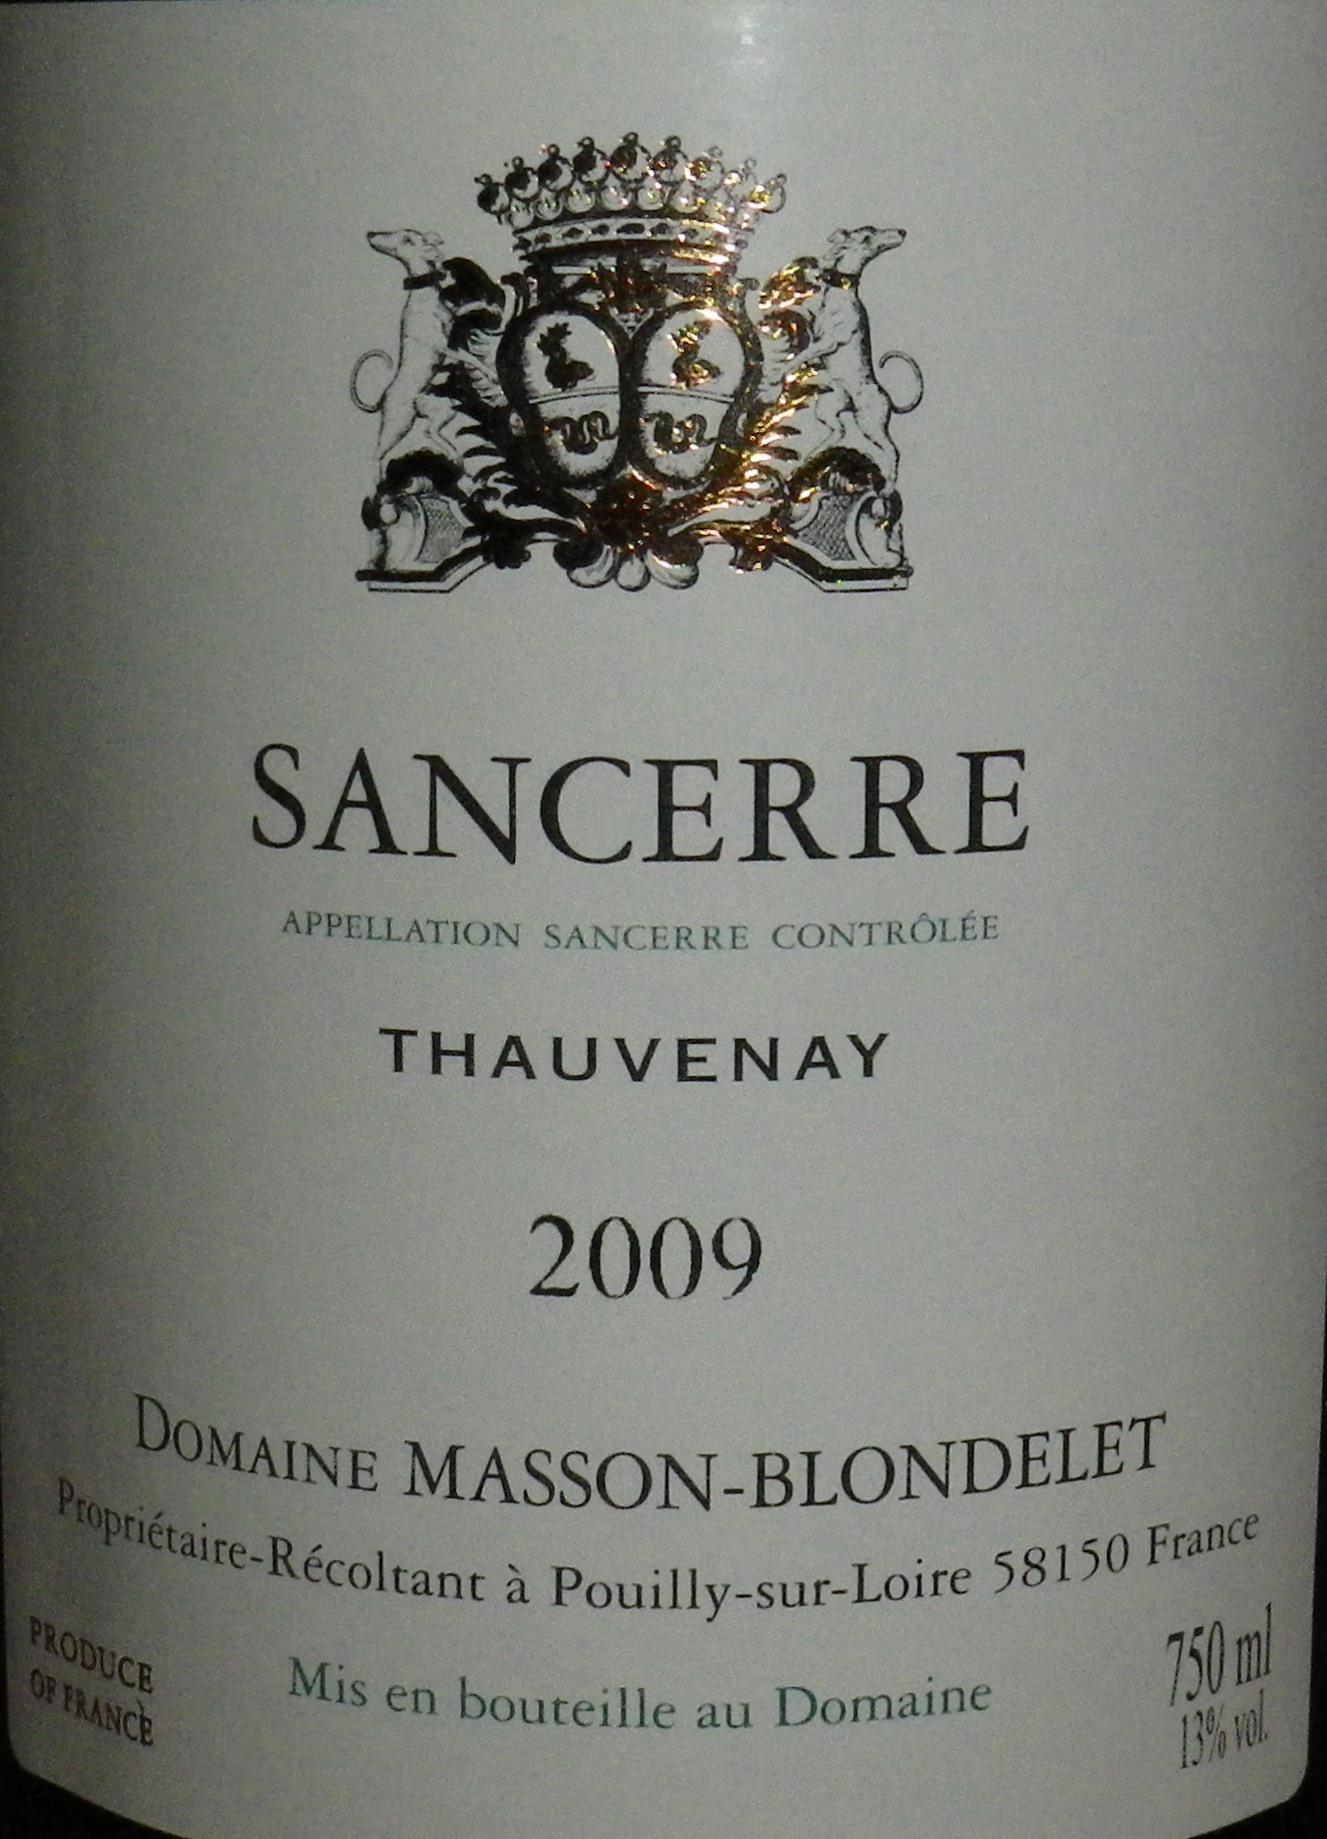 Masson Blondelet Tauvenet 2009